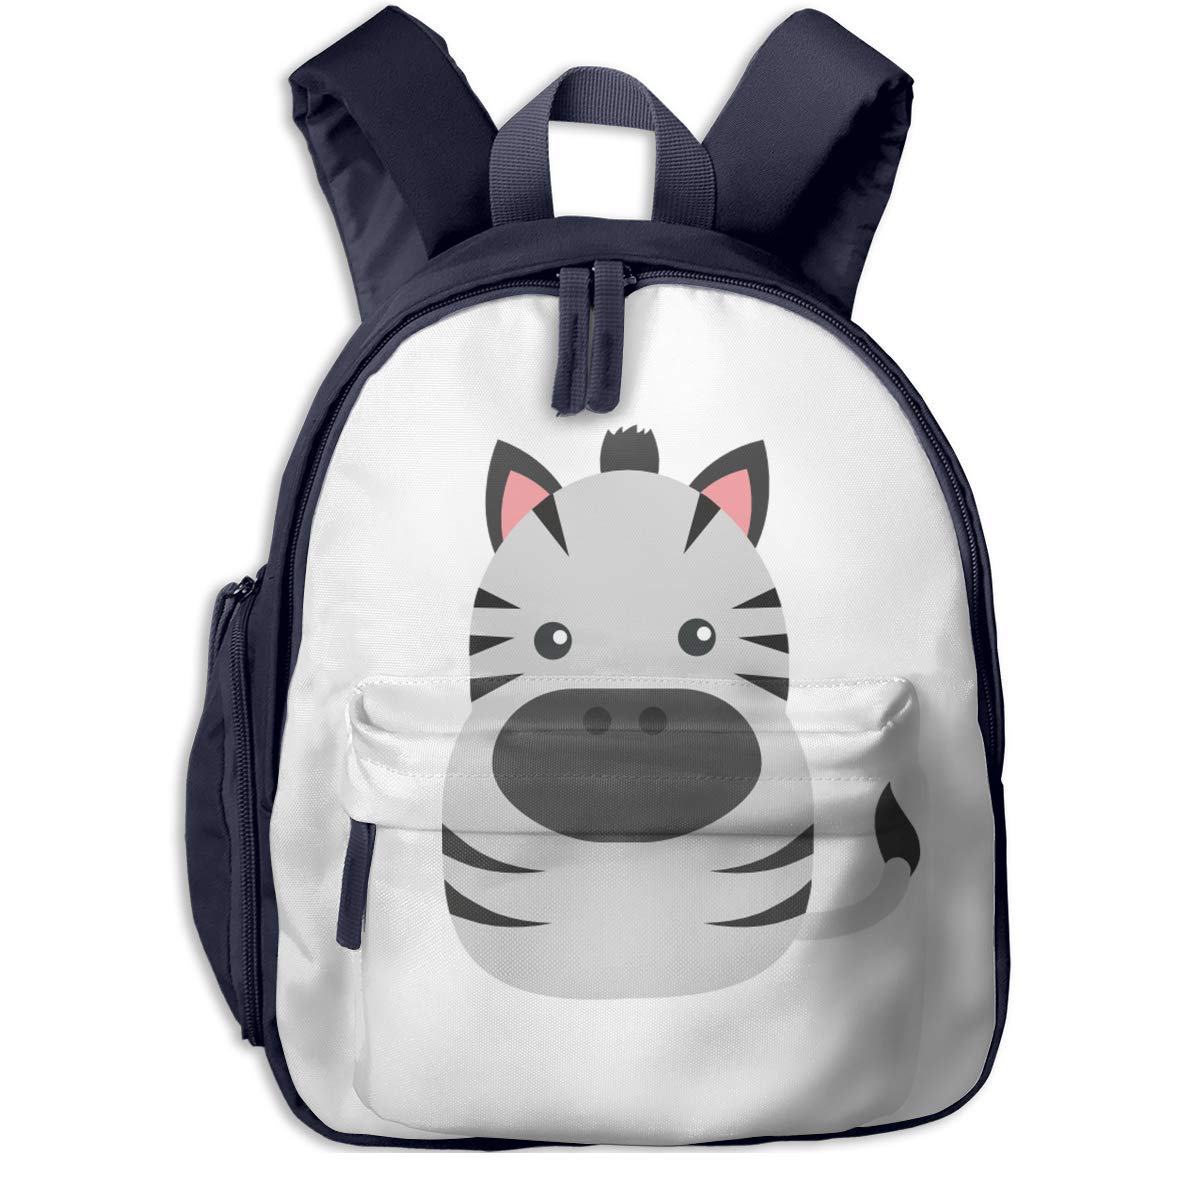 School Backpack for Girls Boys, Kids Cute schwarz and and and Weiß Pig Cartoon Backpacks Book Bag B07LGX6QC2 Daypacks Vitalität 8f5c18